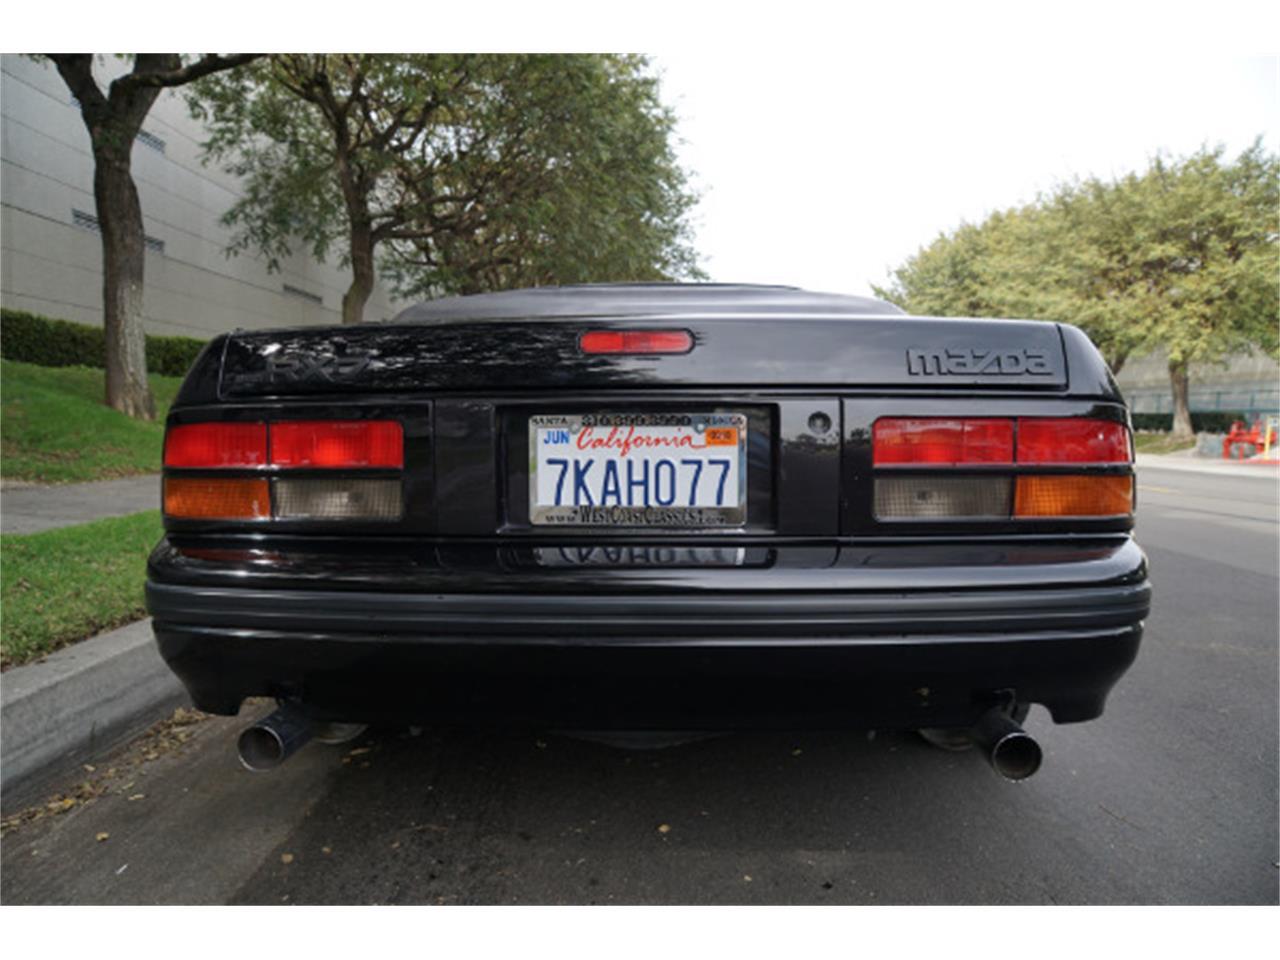 Mazda Dealers Sydney >> 1988 Mazda RX-7 for Sale   ClassicCars.com   CC-1066073